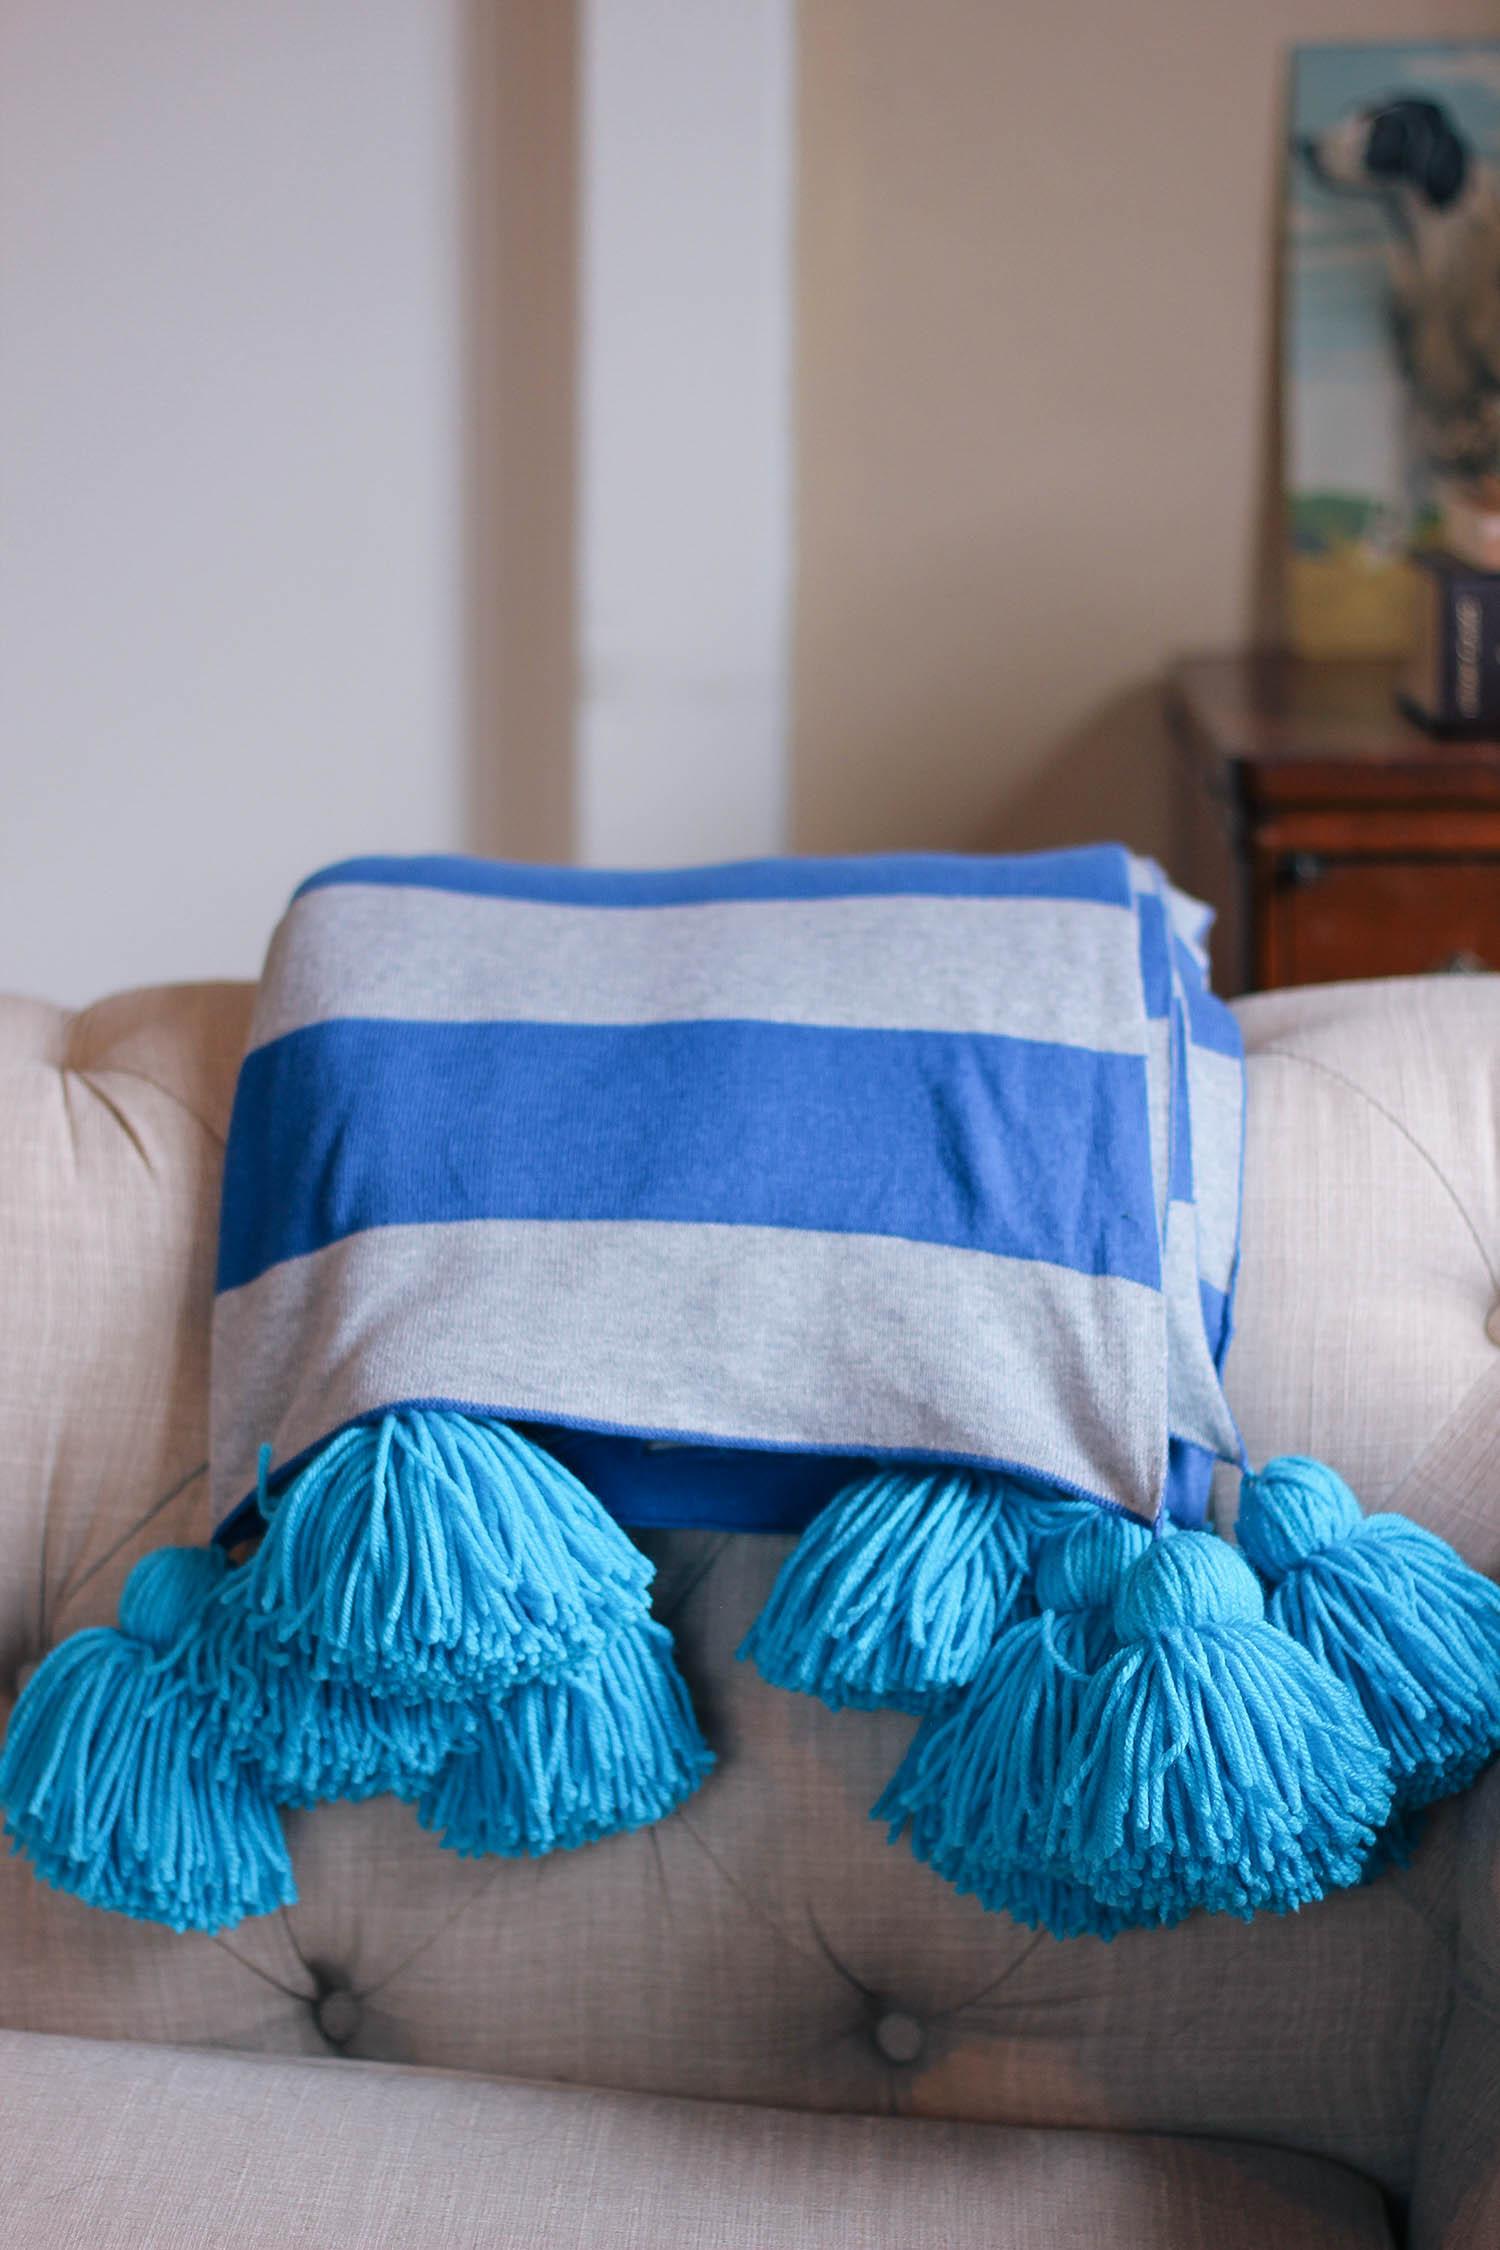 diy-pom-pom-blanket-4